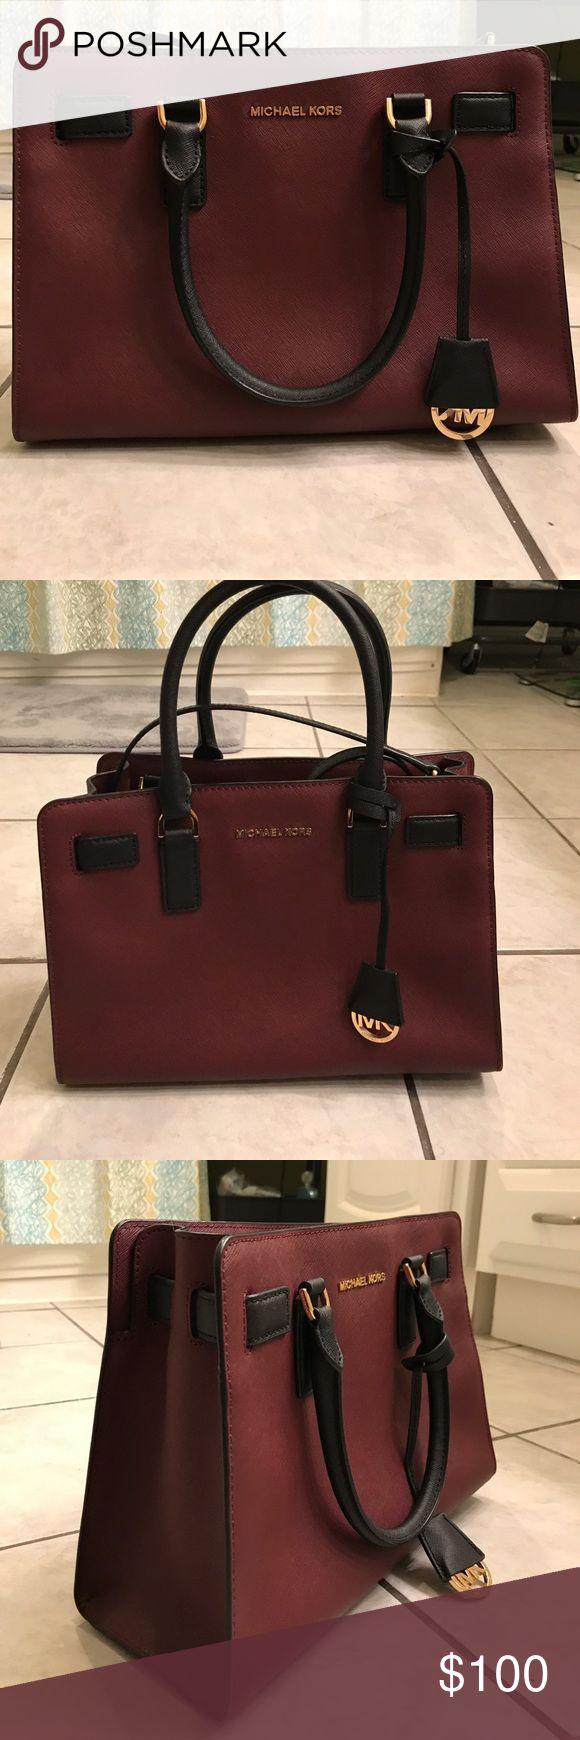 Merlot/Black Selma Michael Kors Purse Merlot & black Michael Kors purse, gently used, no scrapes, no stains inside or creased leather. Michael Kors Bags Satchels